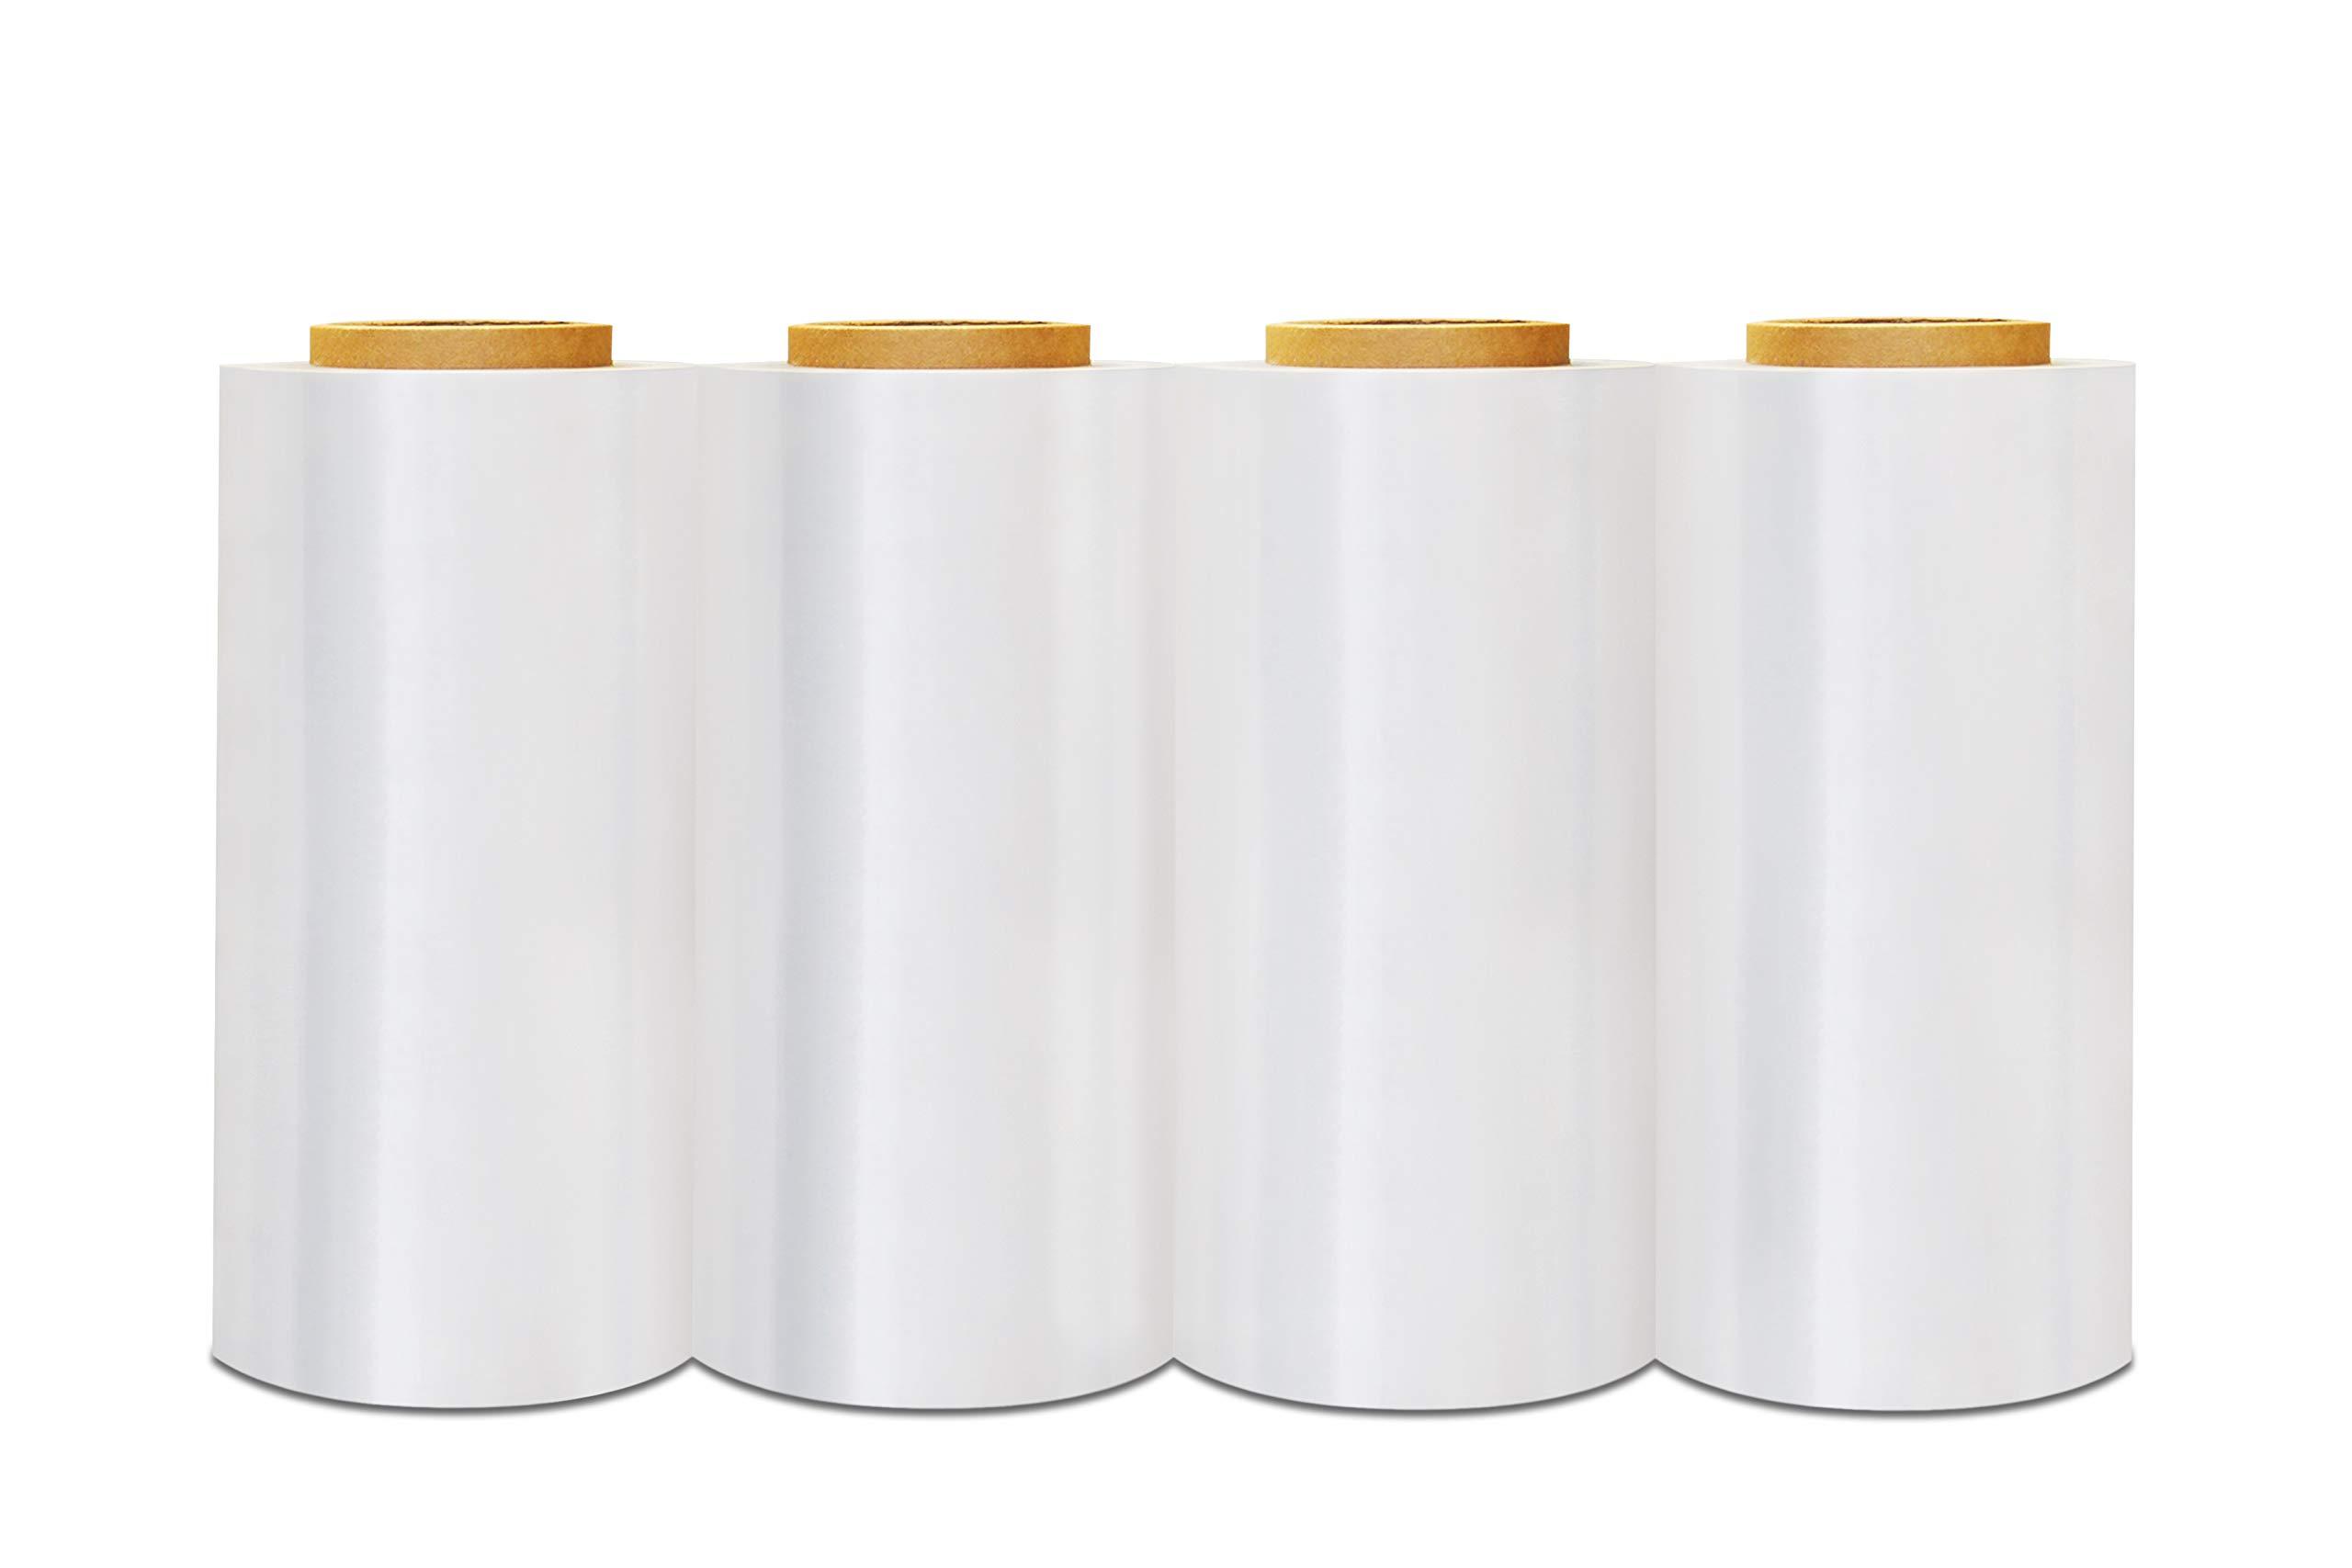 Plastic Packing Wrap, Blown Stretch Film Rolls, Clear, 12 Inch x 1500 Feet, 80 Gauge, 4 Pack